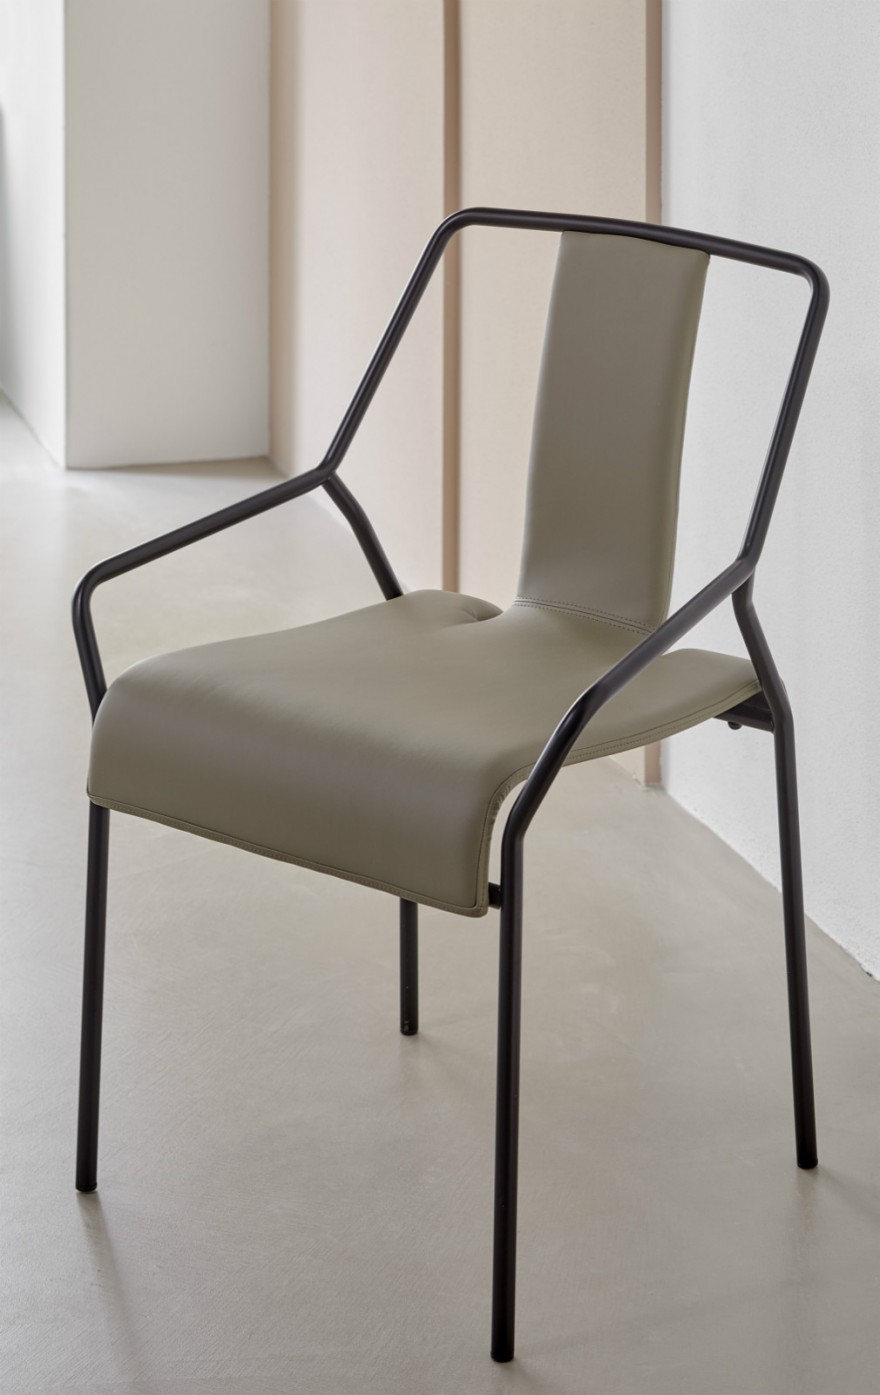 DAO chair Victors Design Agency